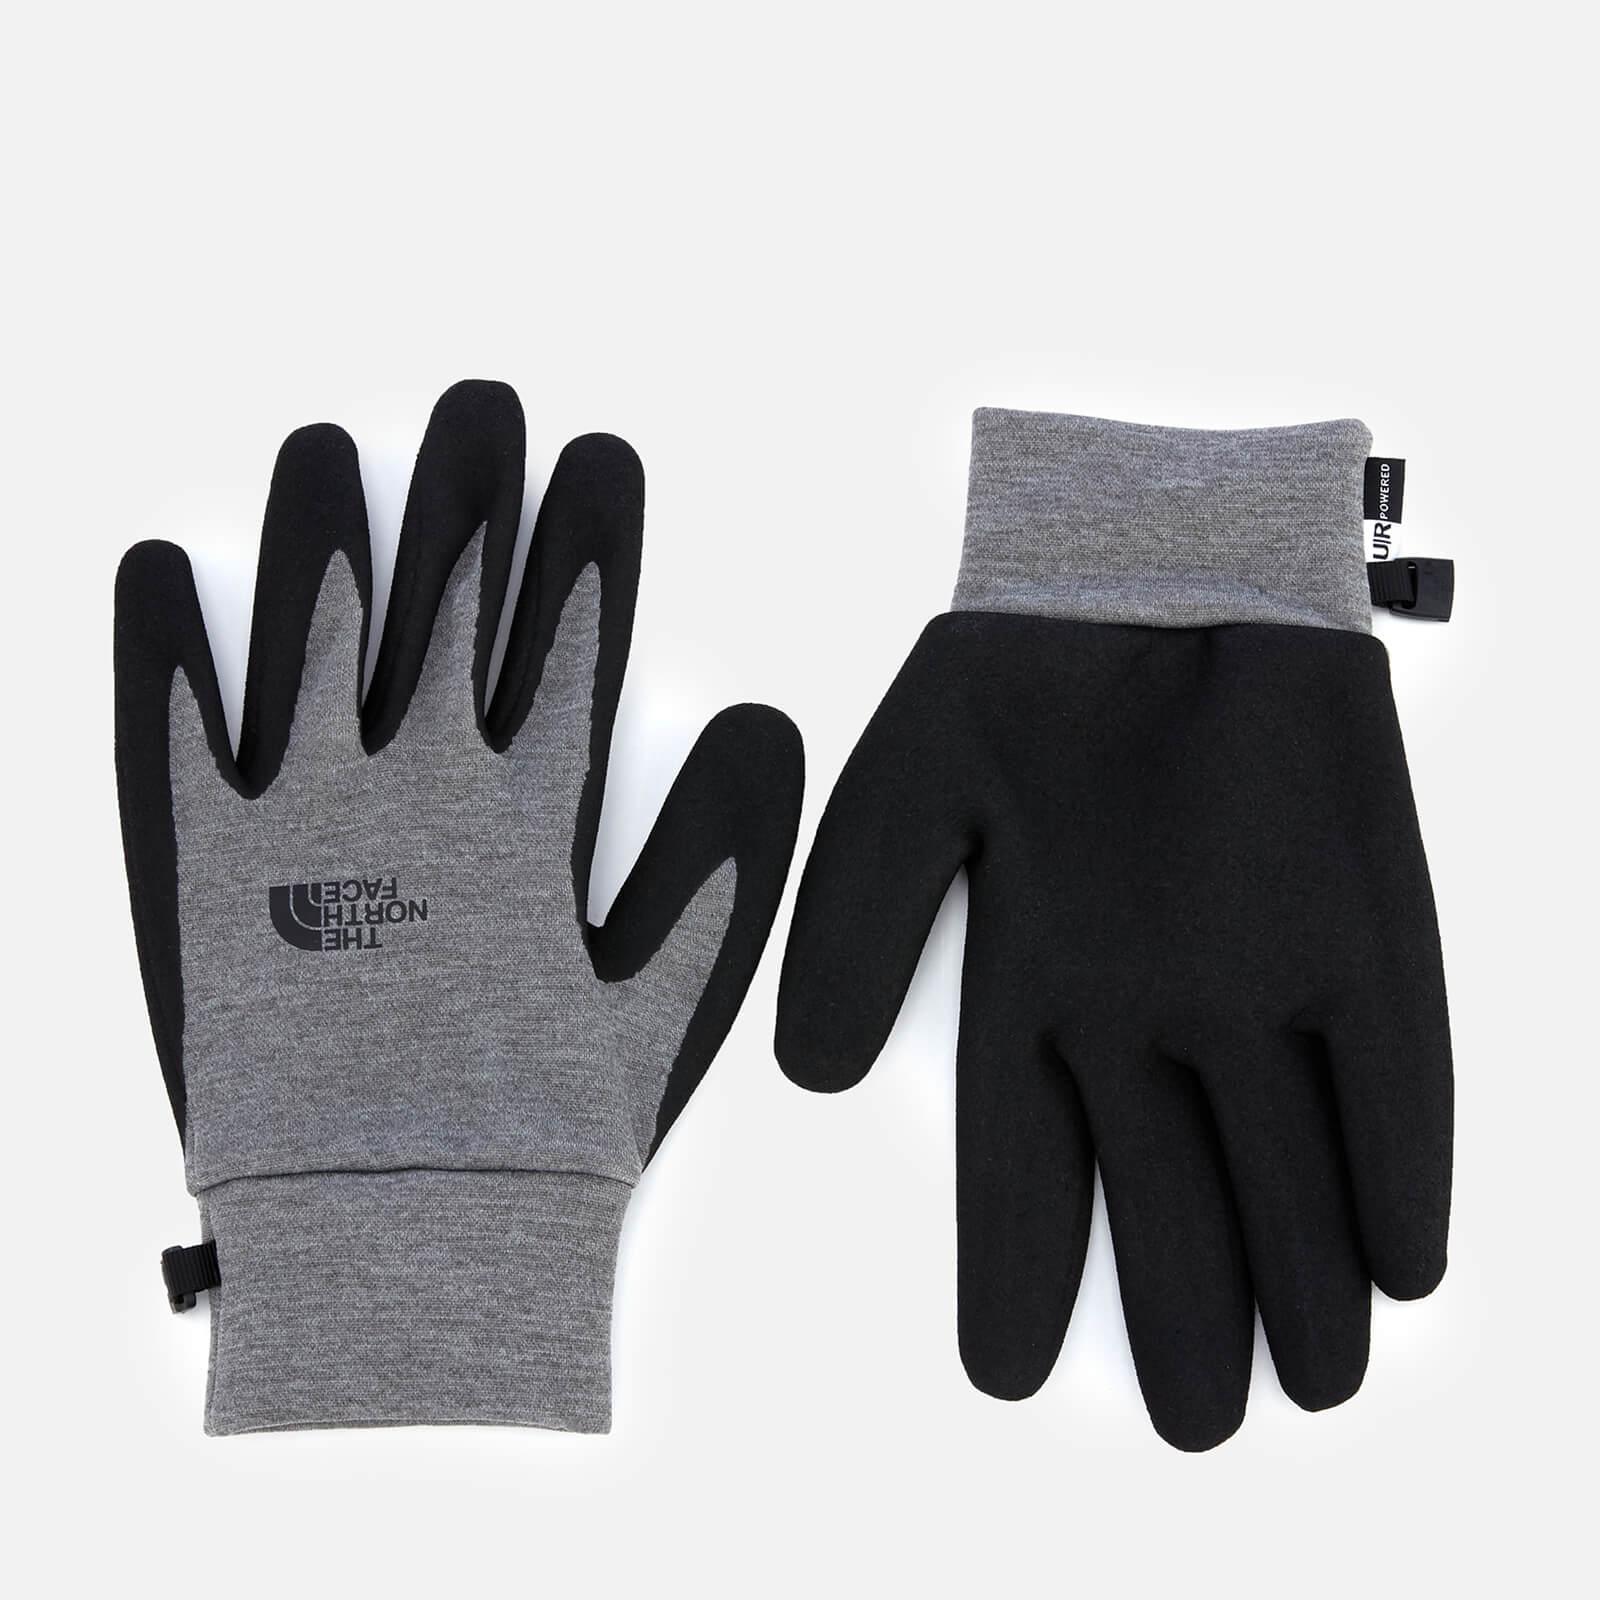 dfe9c587e The North Face Etip Grip Gloves - Medium Grey Heather